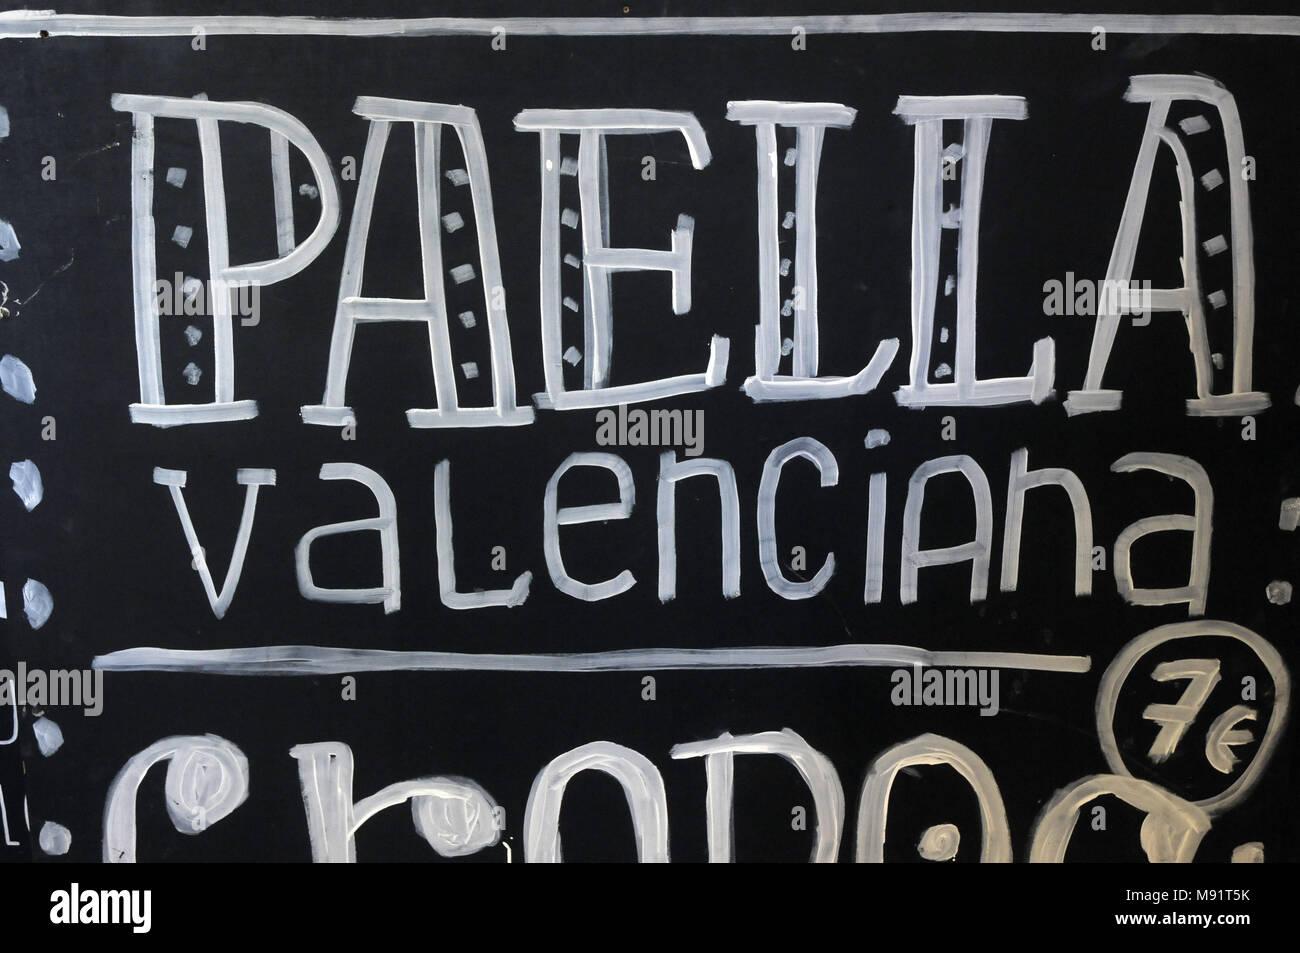 valencia blackboard